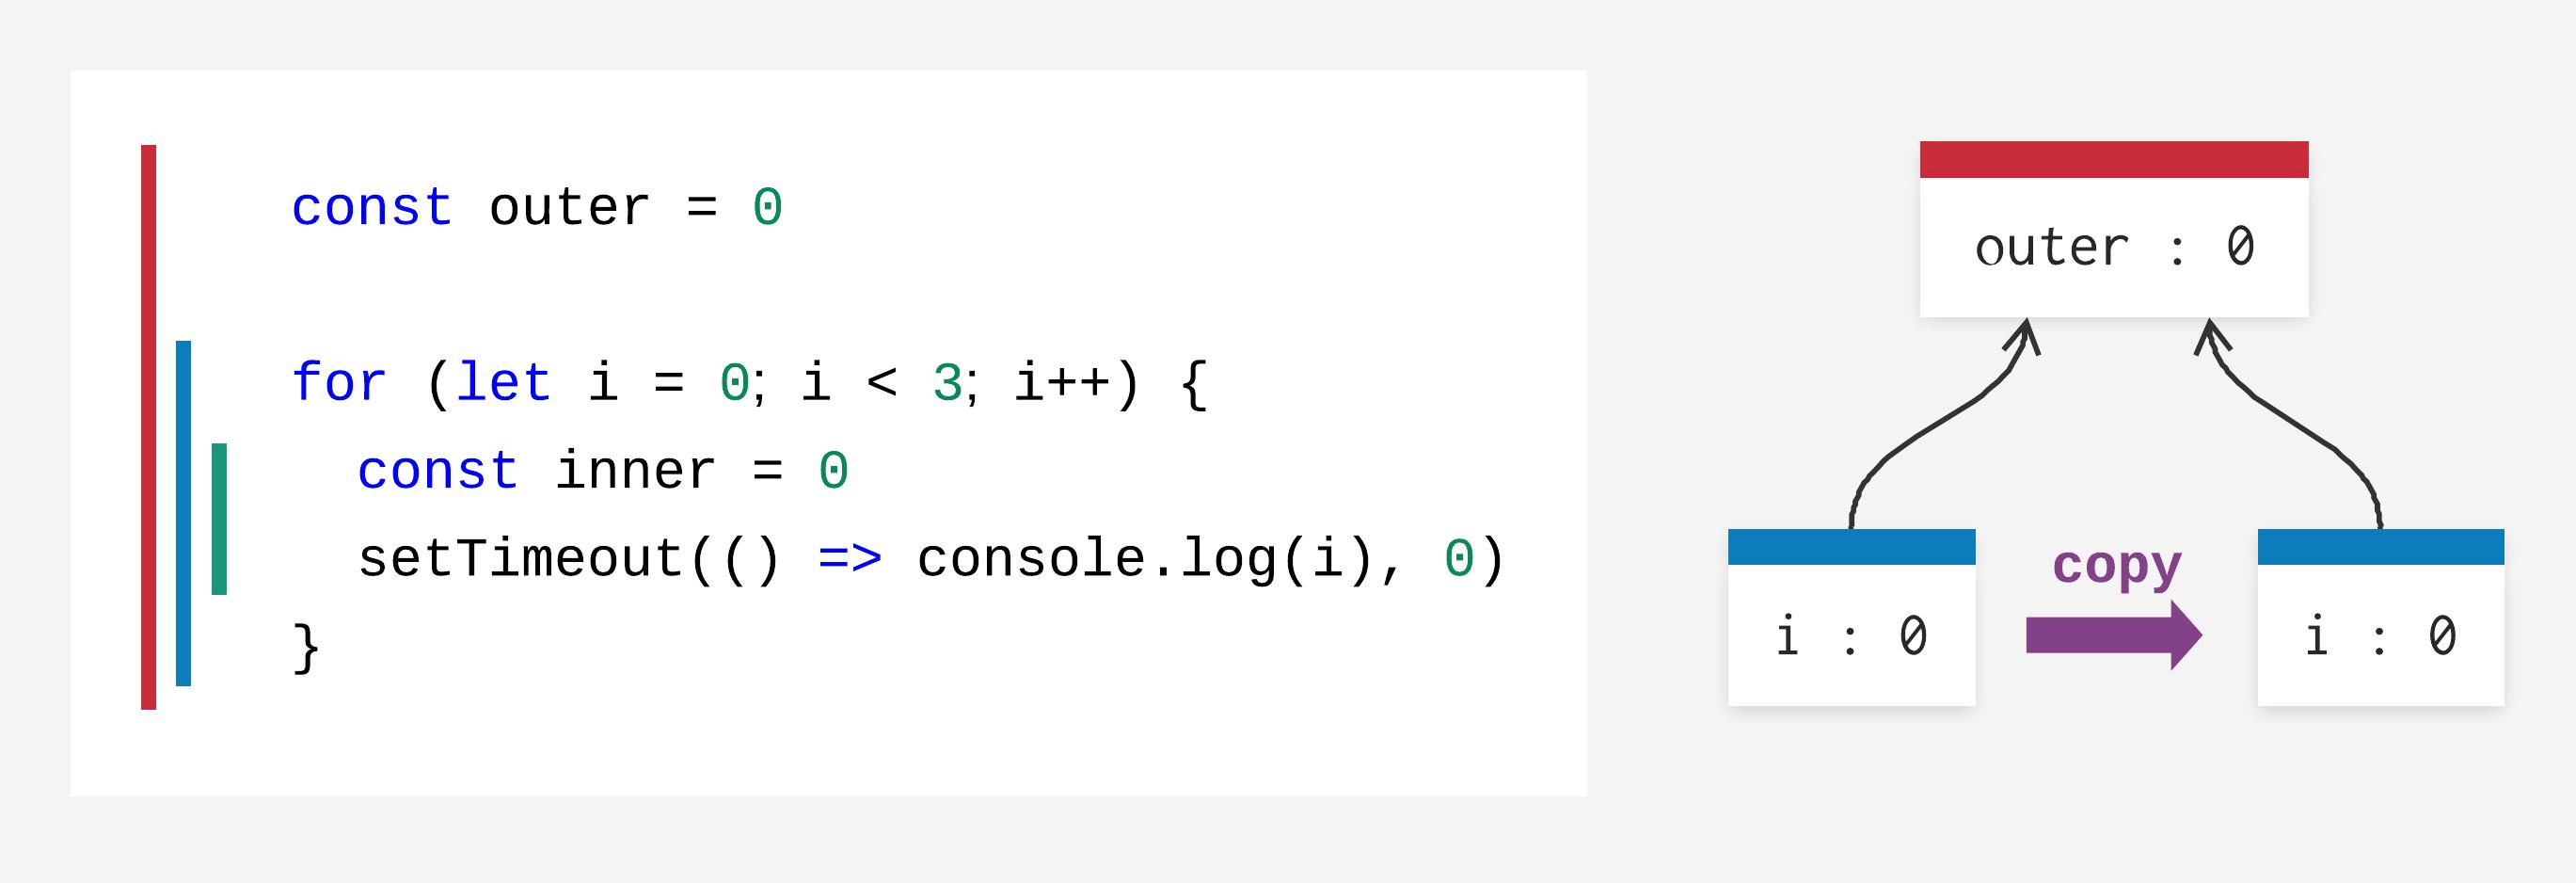 for-loop copy1.png